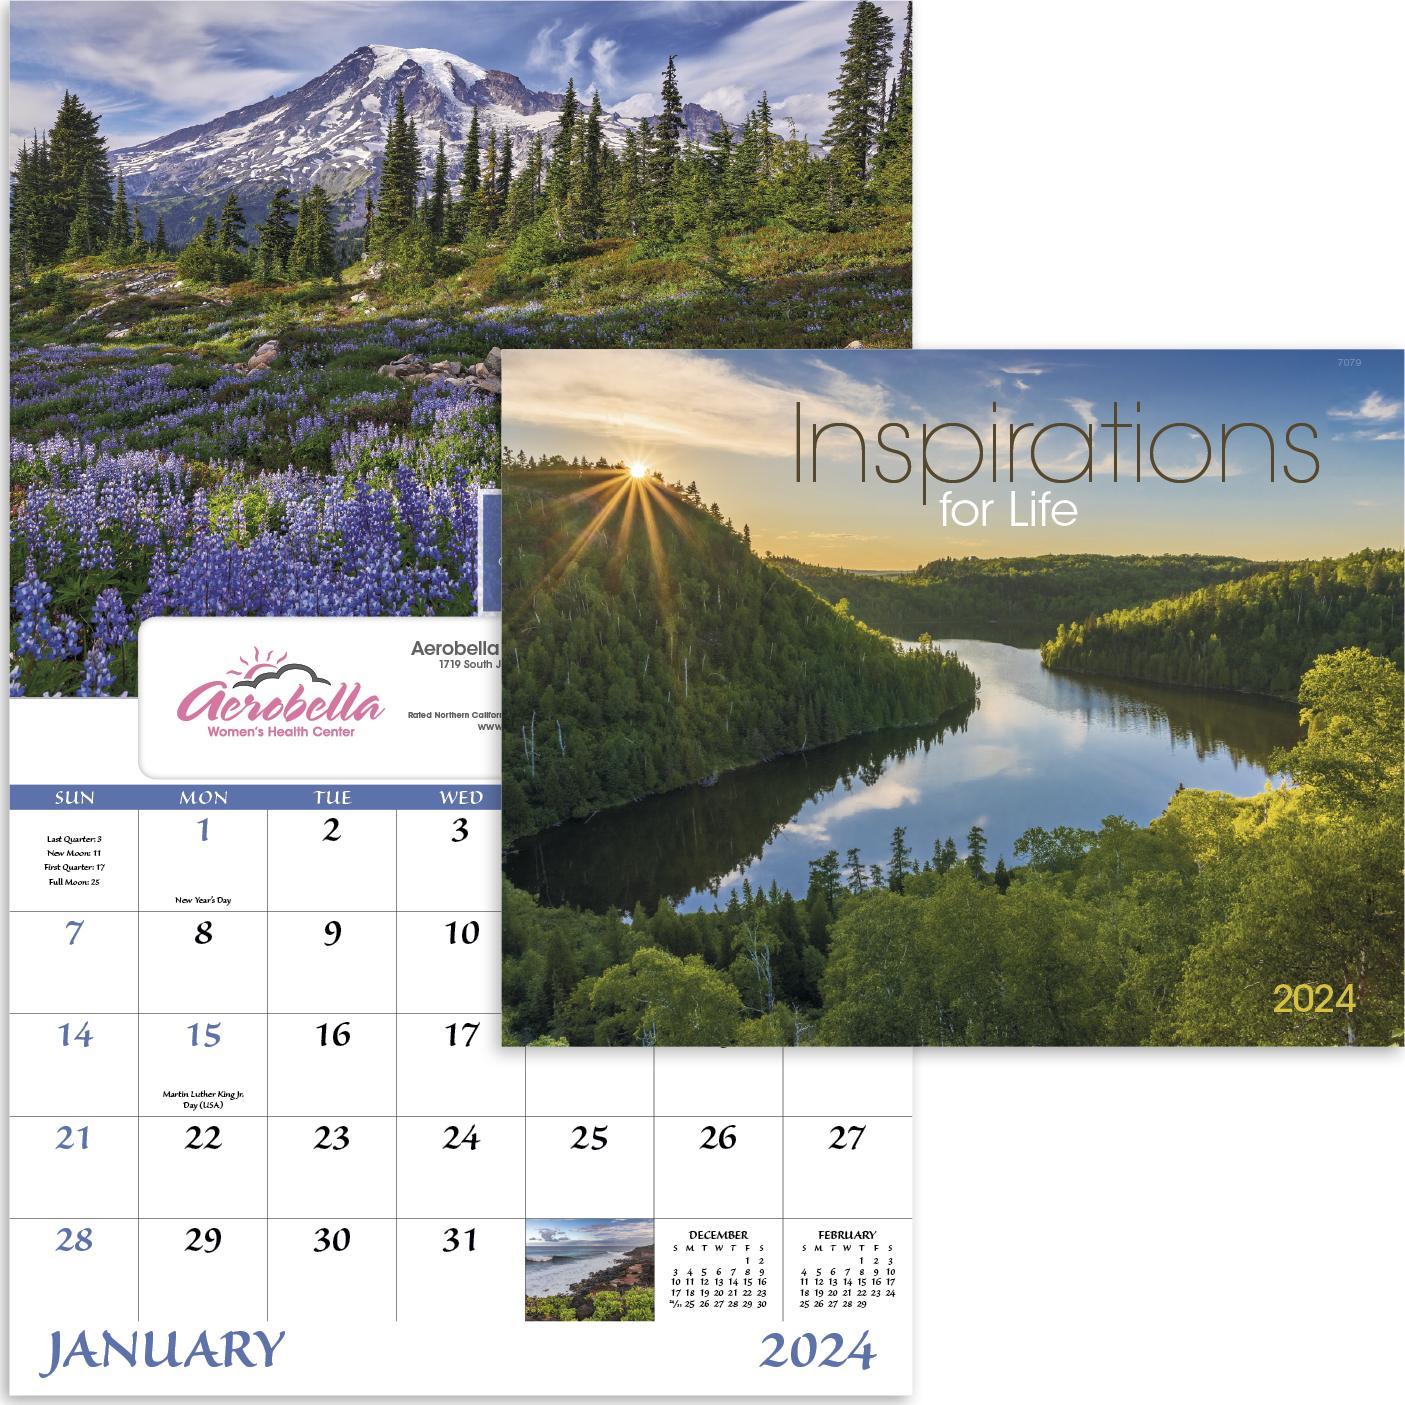 Inspirations for Life Window Calendar (2020)